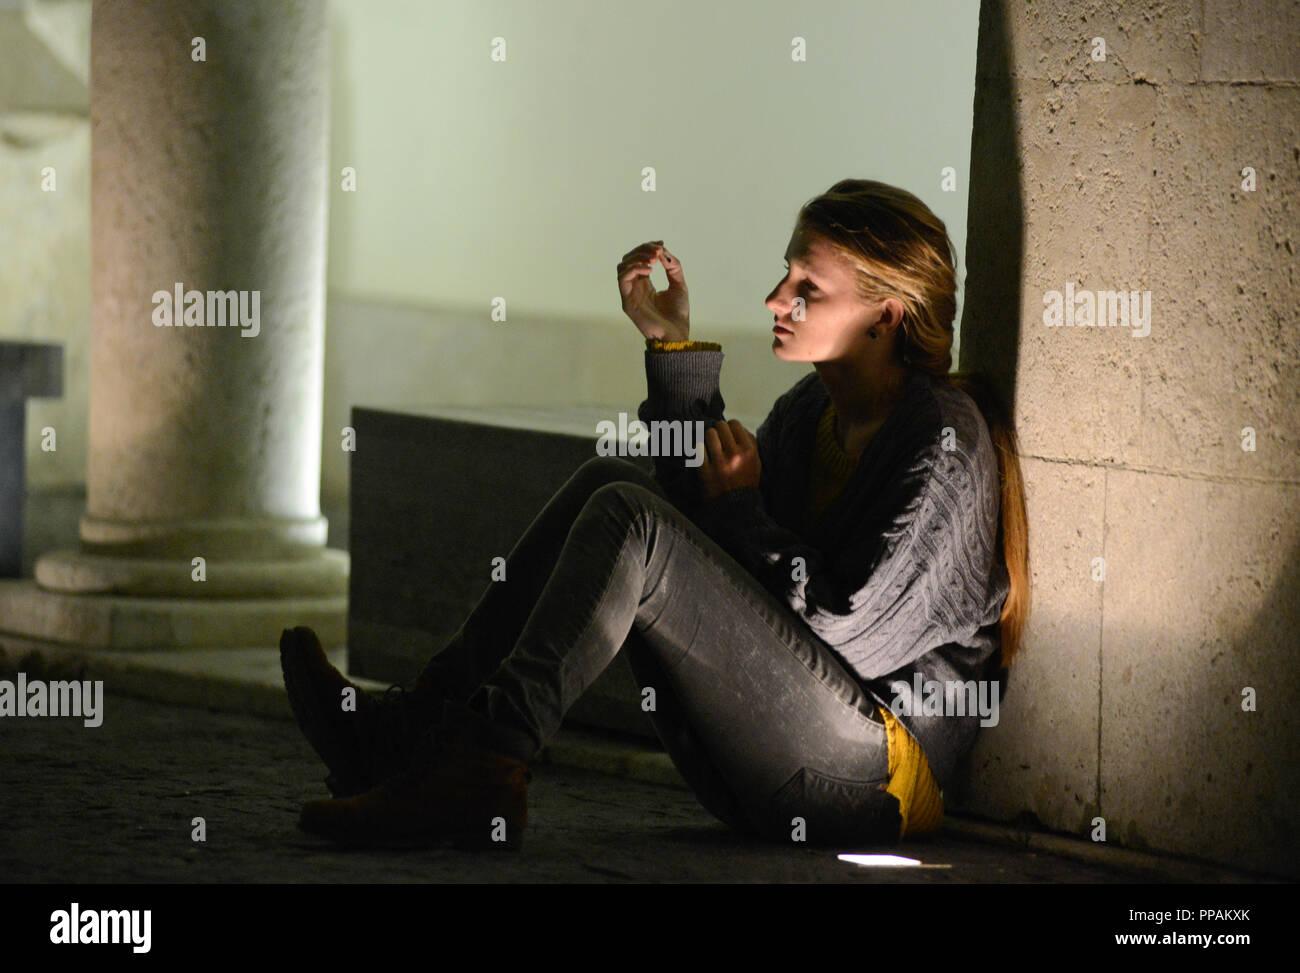 dating slovakian girl hb.html